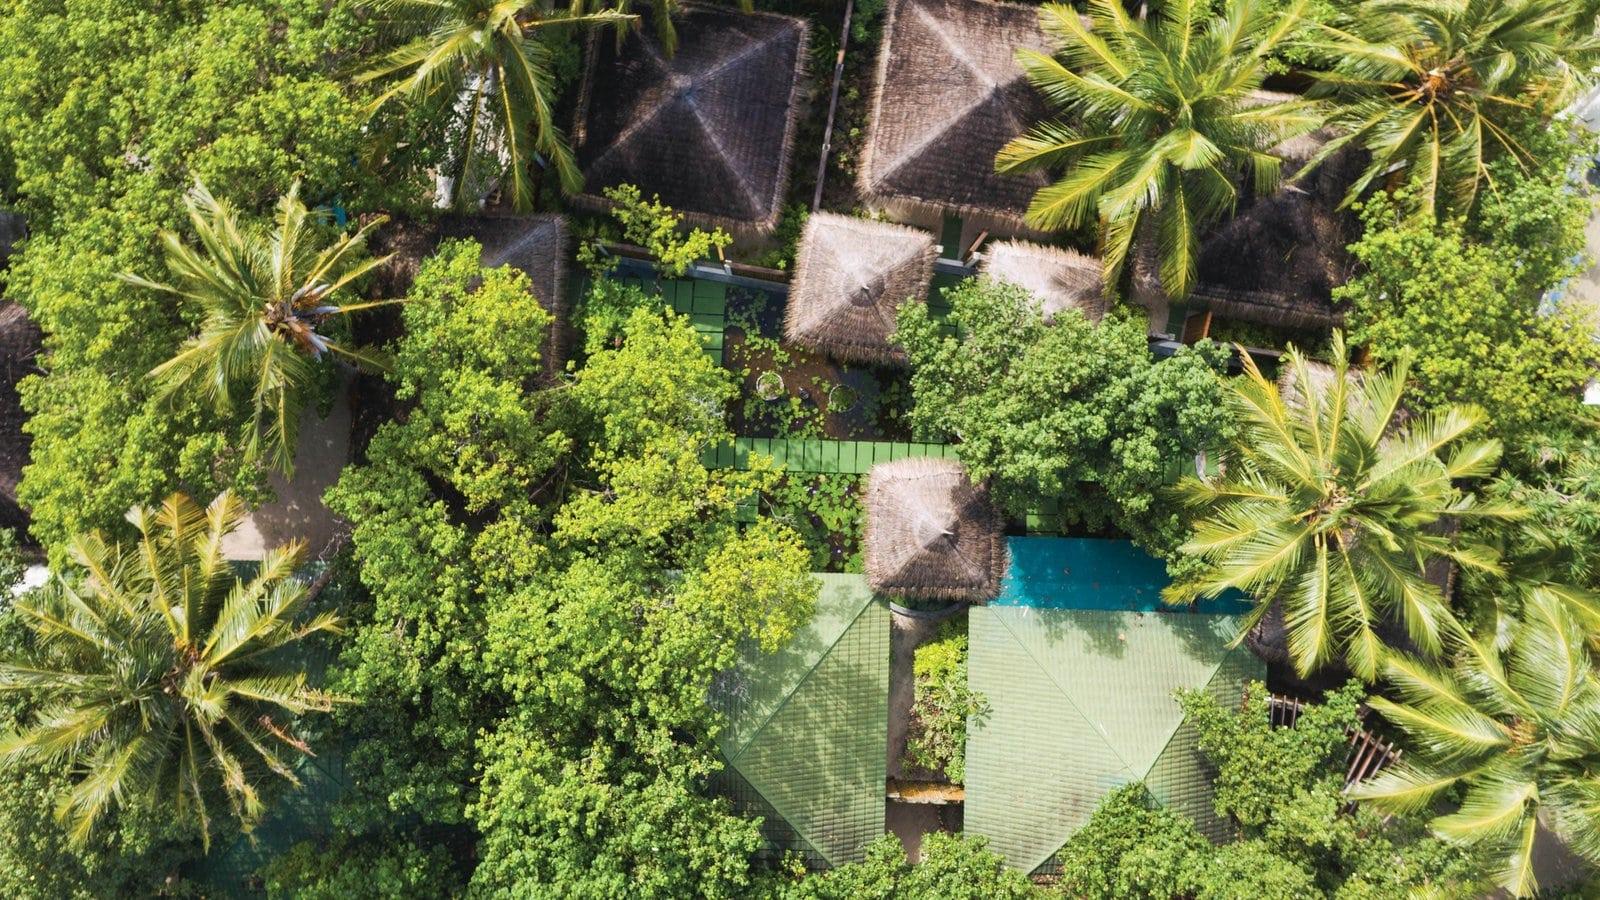 Мальдивы, отель OBLU by Atmosphere at Helengeli, спа